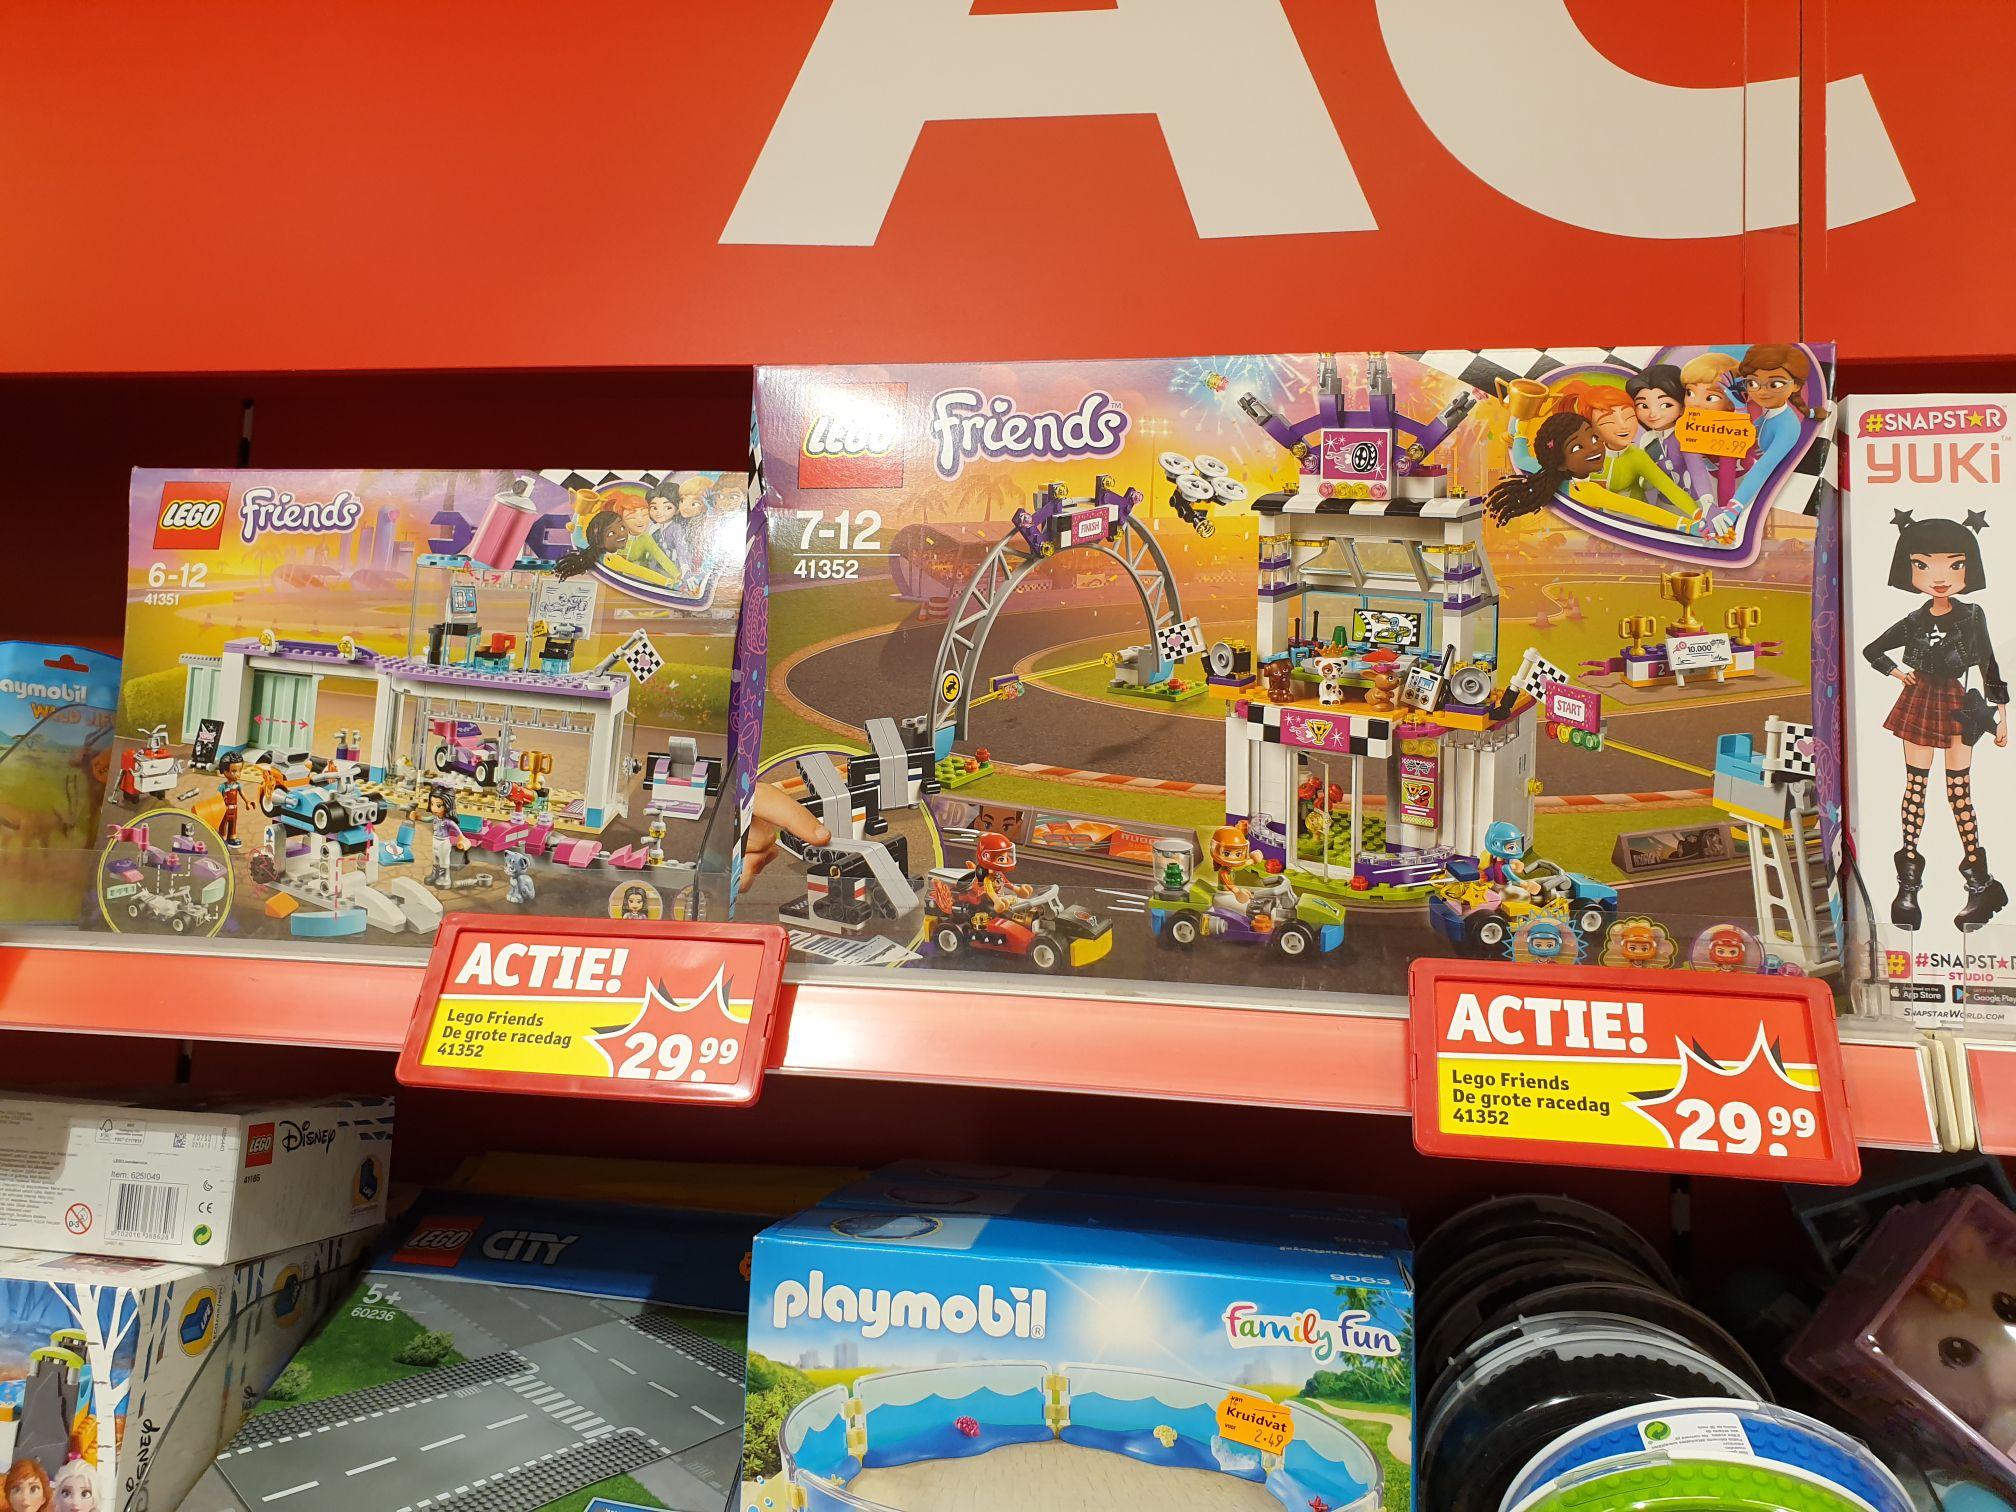 [Lokaal] Lego set 41352 @ Kruidvat Didam